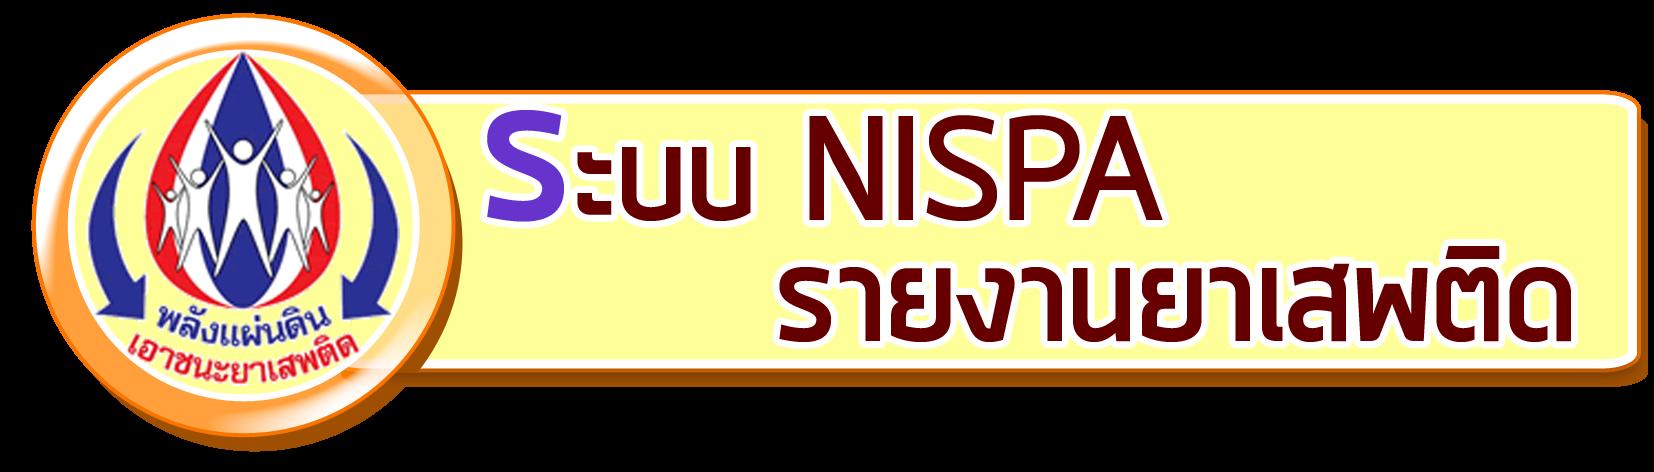 https://nispa.nccd.go.th/2013/